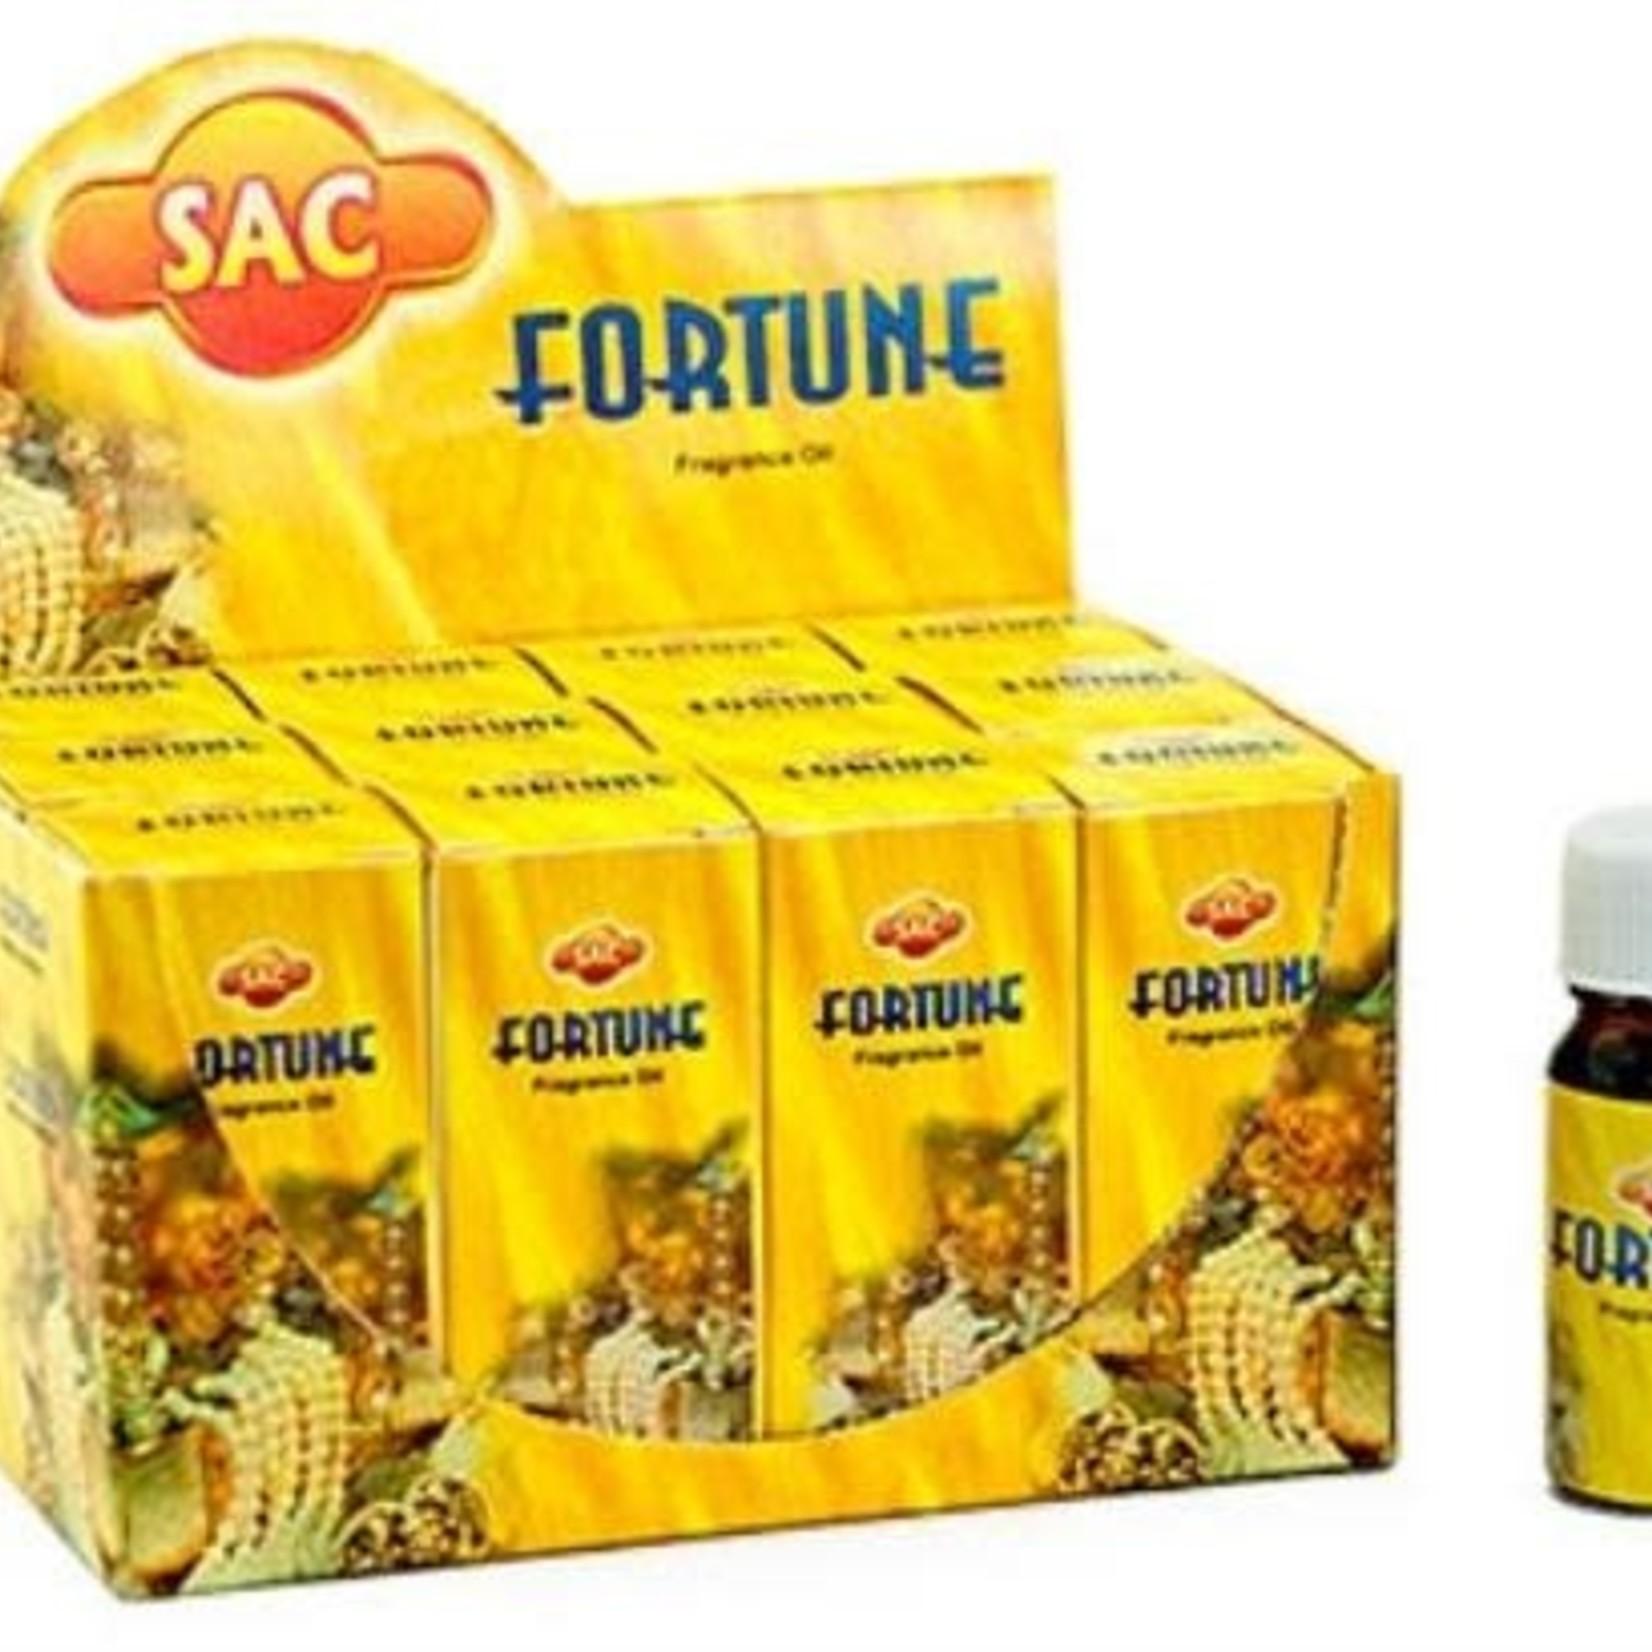 Fortune Fragrance Oil - SAC